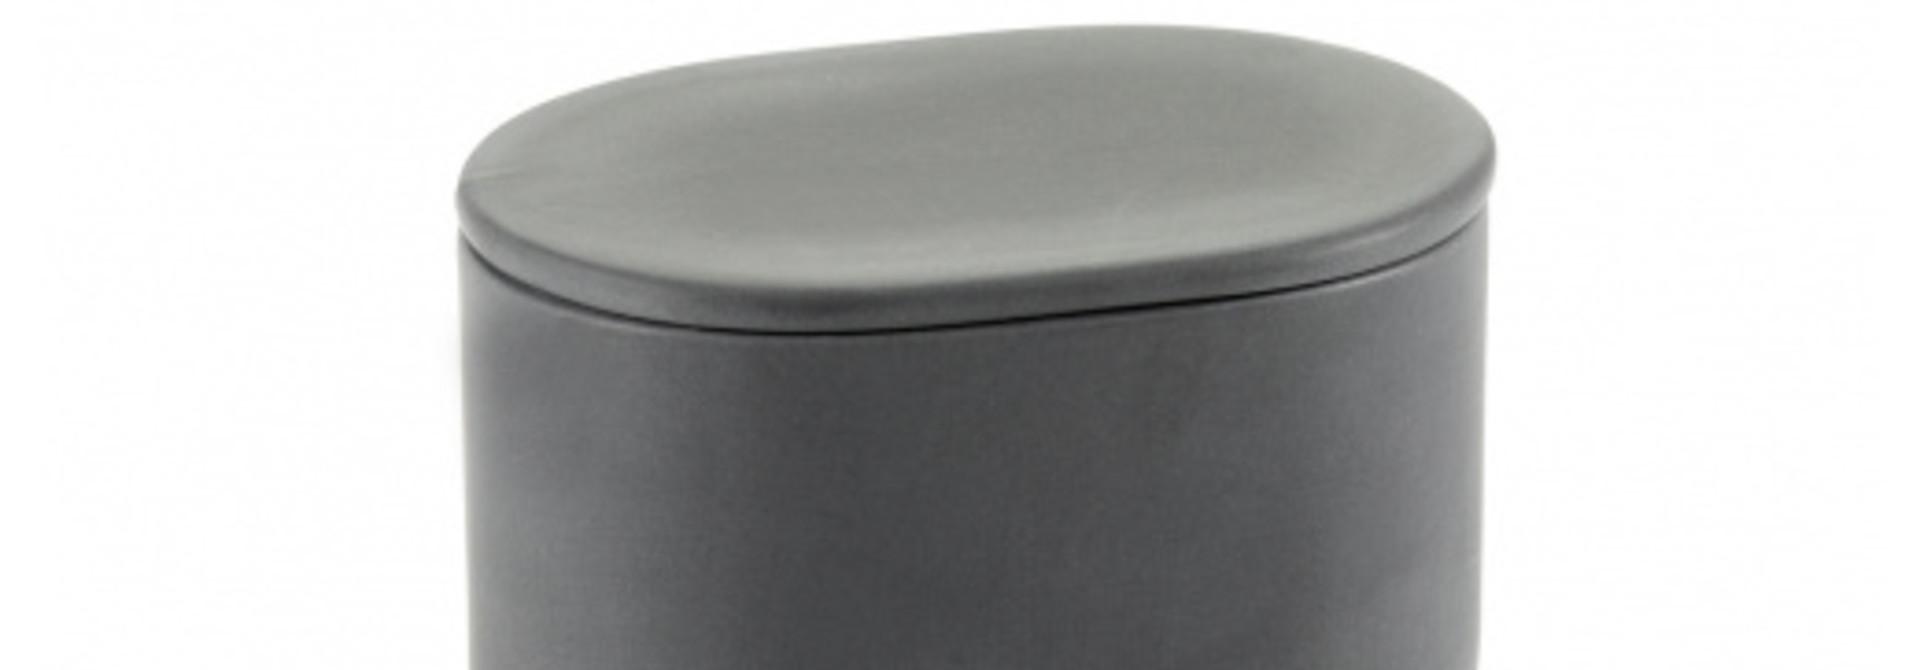 Oval Box w/Lid - Cose - Dk Grey